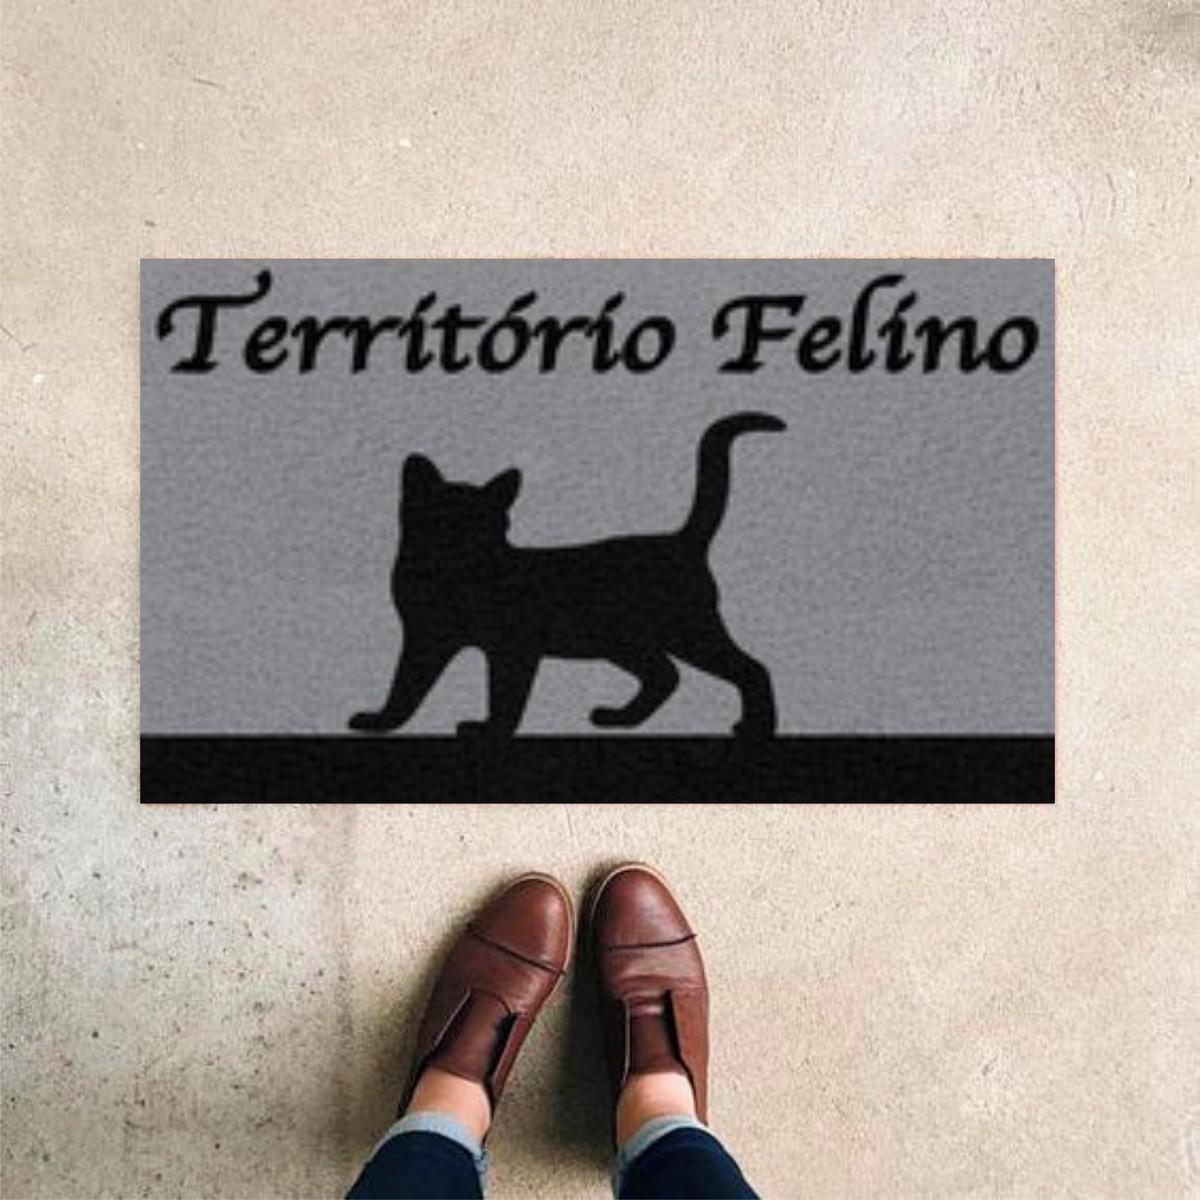 TAPETE CAPACHO TERRITORIO FELINO